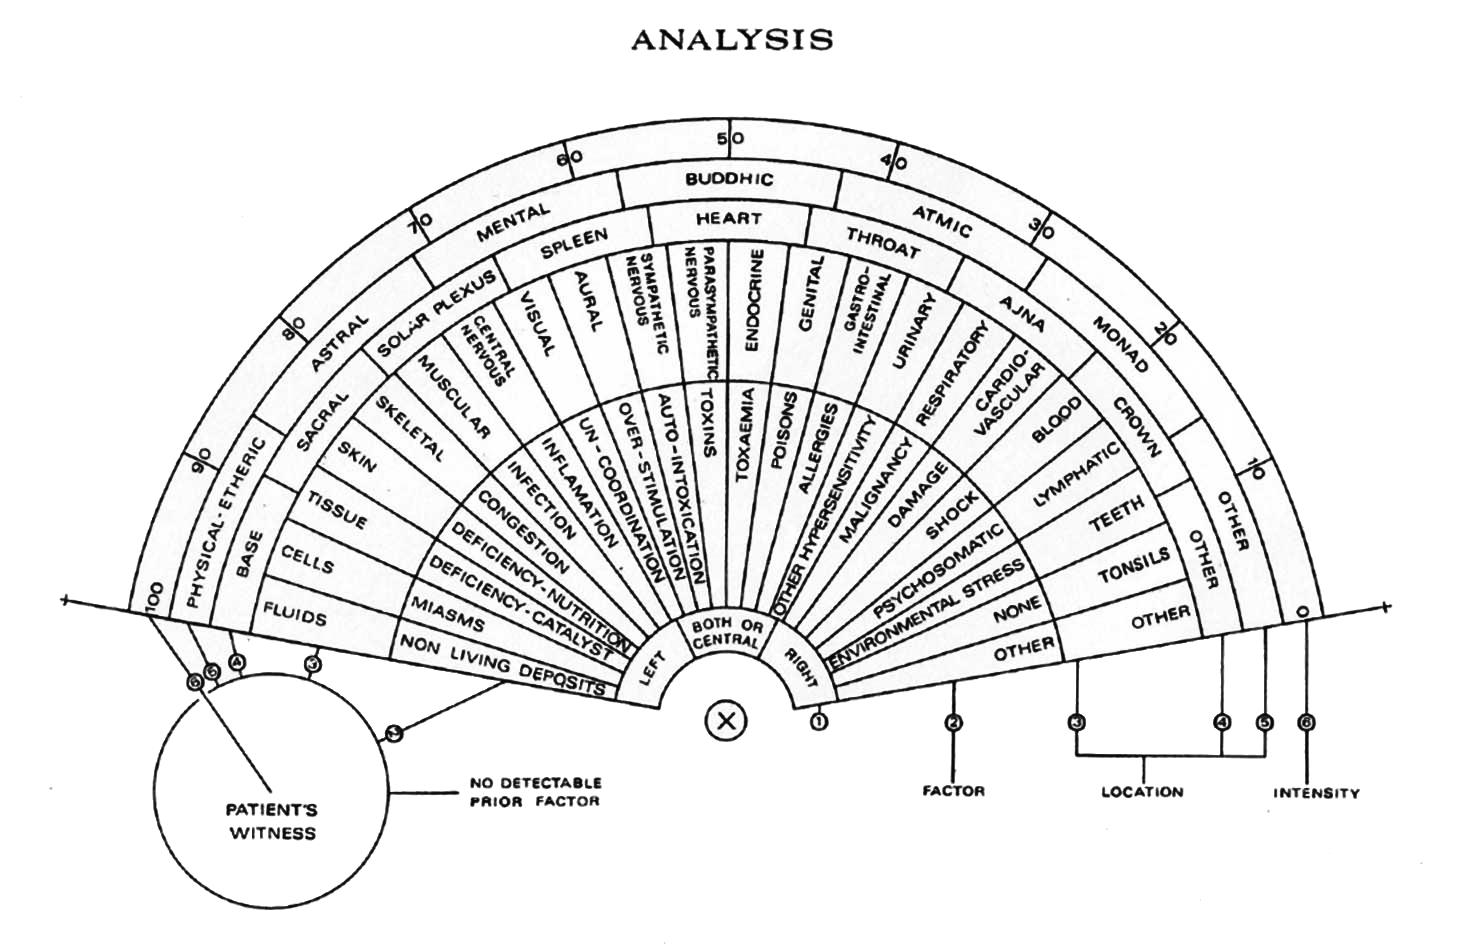 Malcolm Rae dowsing anlaysis chart